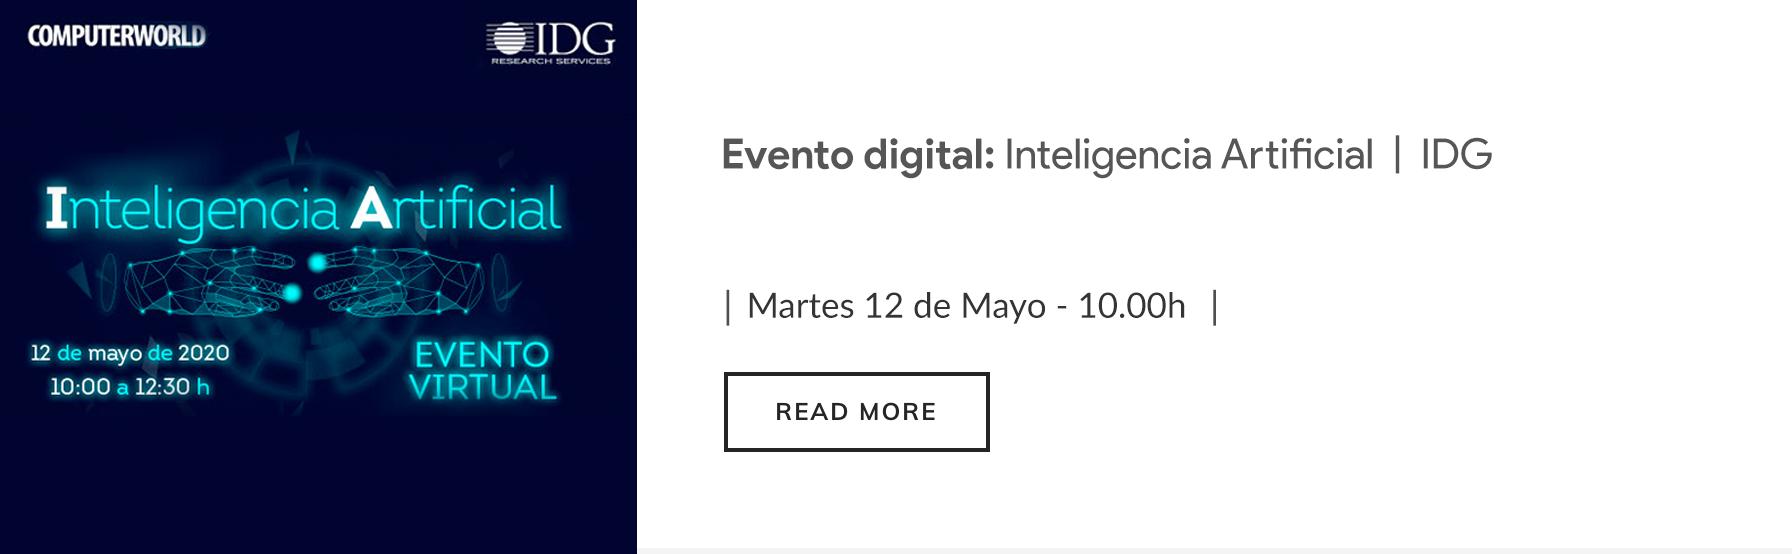 Evento IDG 12 de mayo